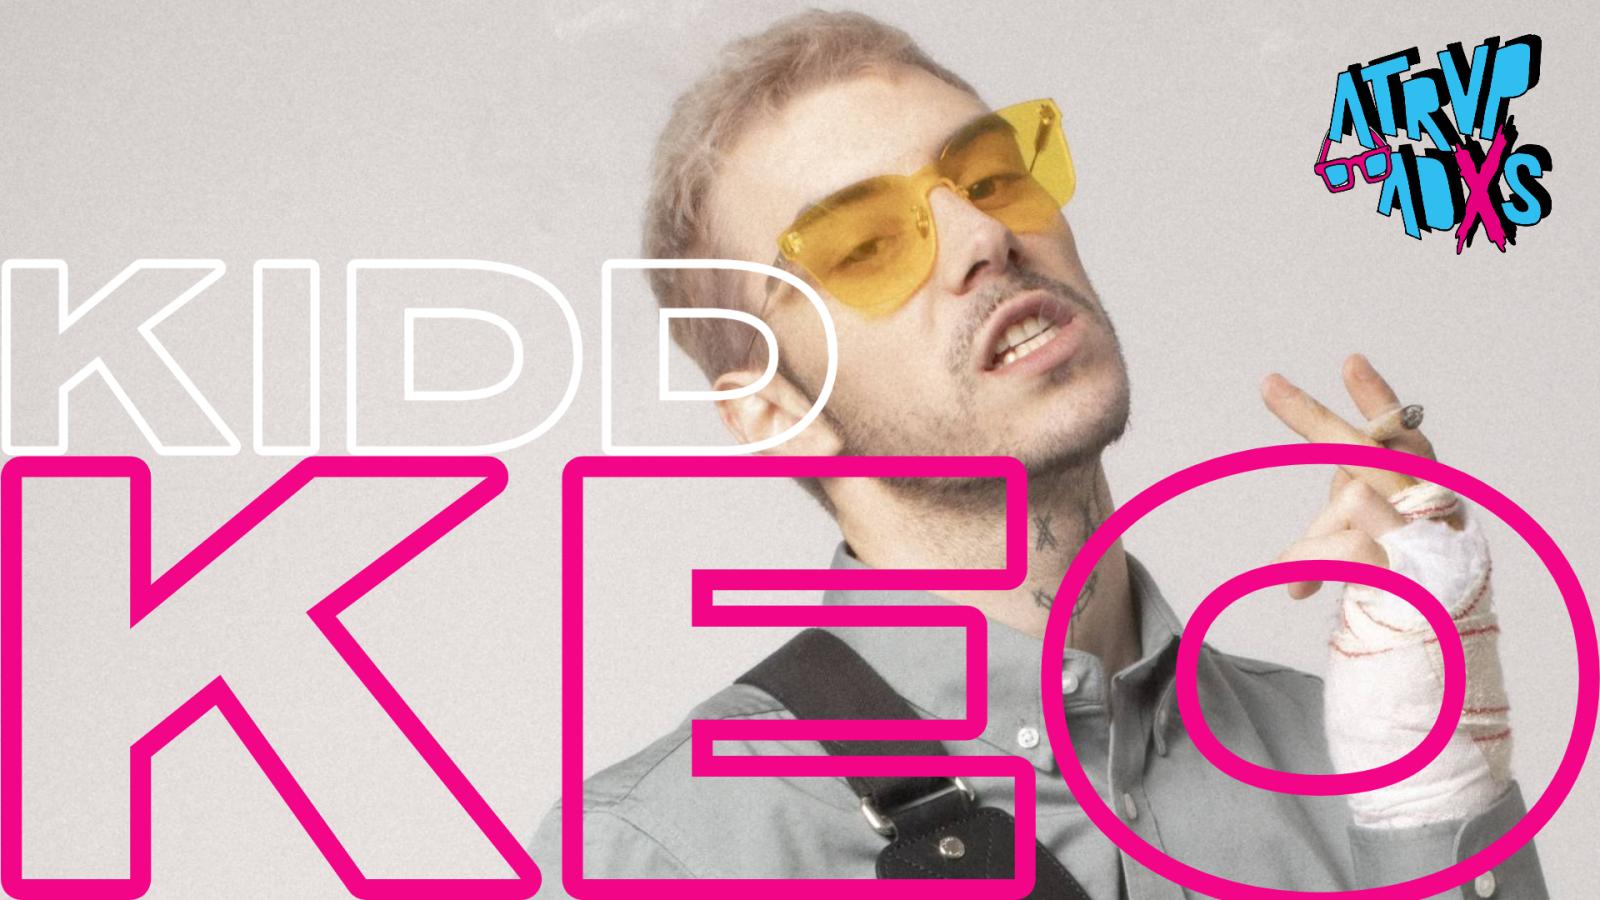 Atrvpadxs - Kidd Keo - Ver ahora